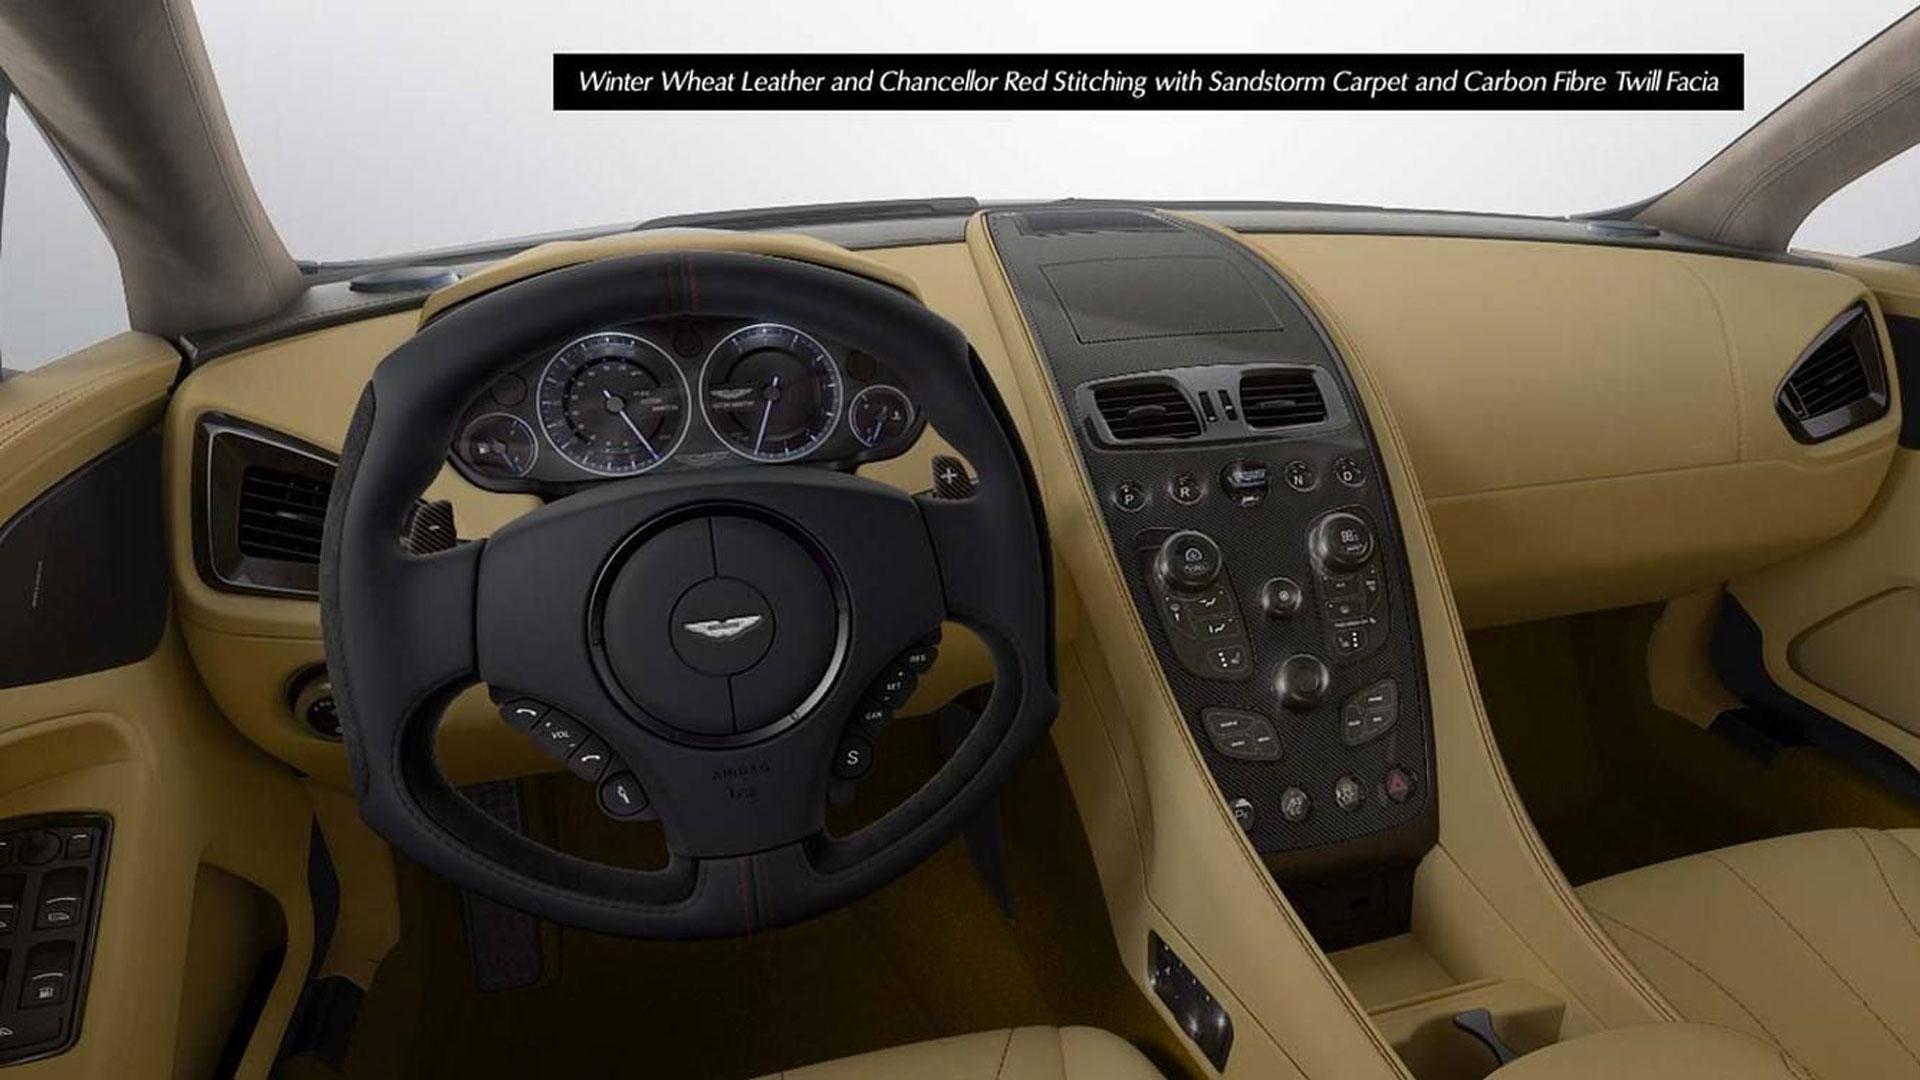 Winter Weat Aston Martin Vanquish Dashboard